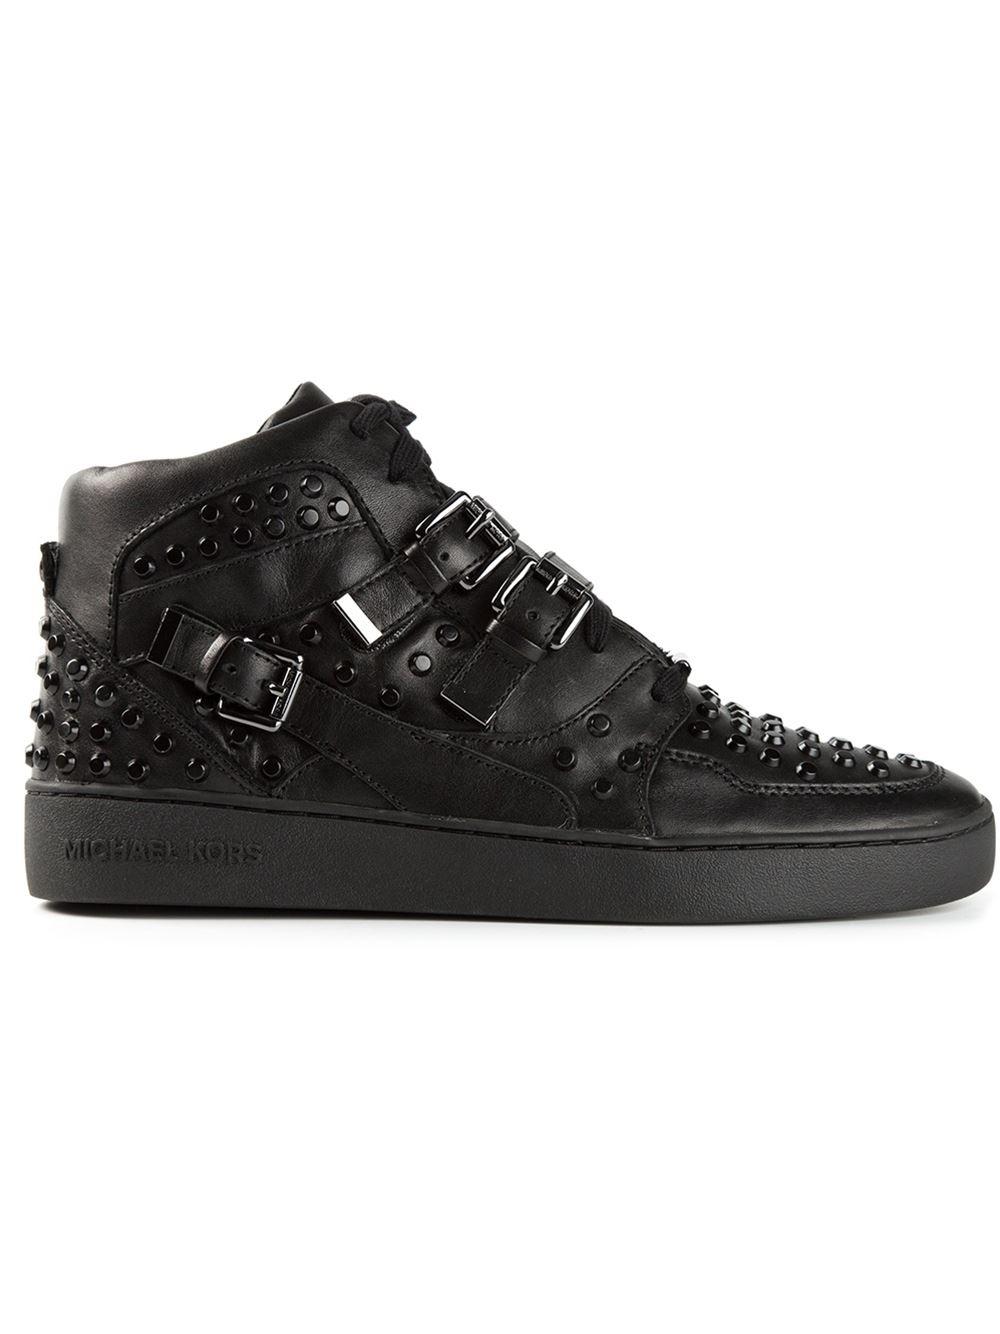 MICHAEL Michael Kors 'Bryn' Hi-Top Sneakers in Black